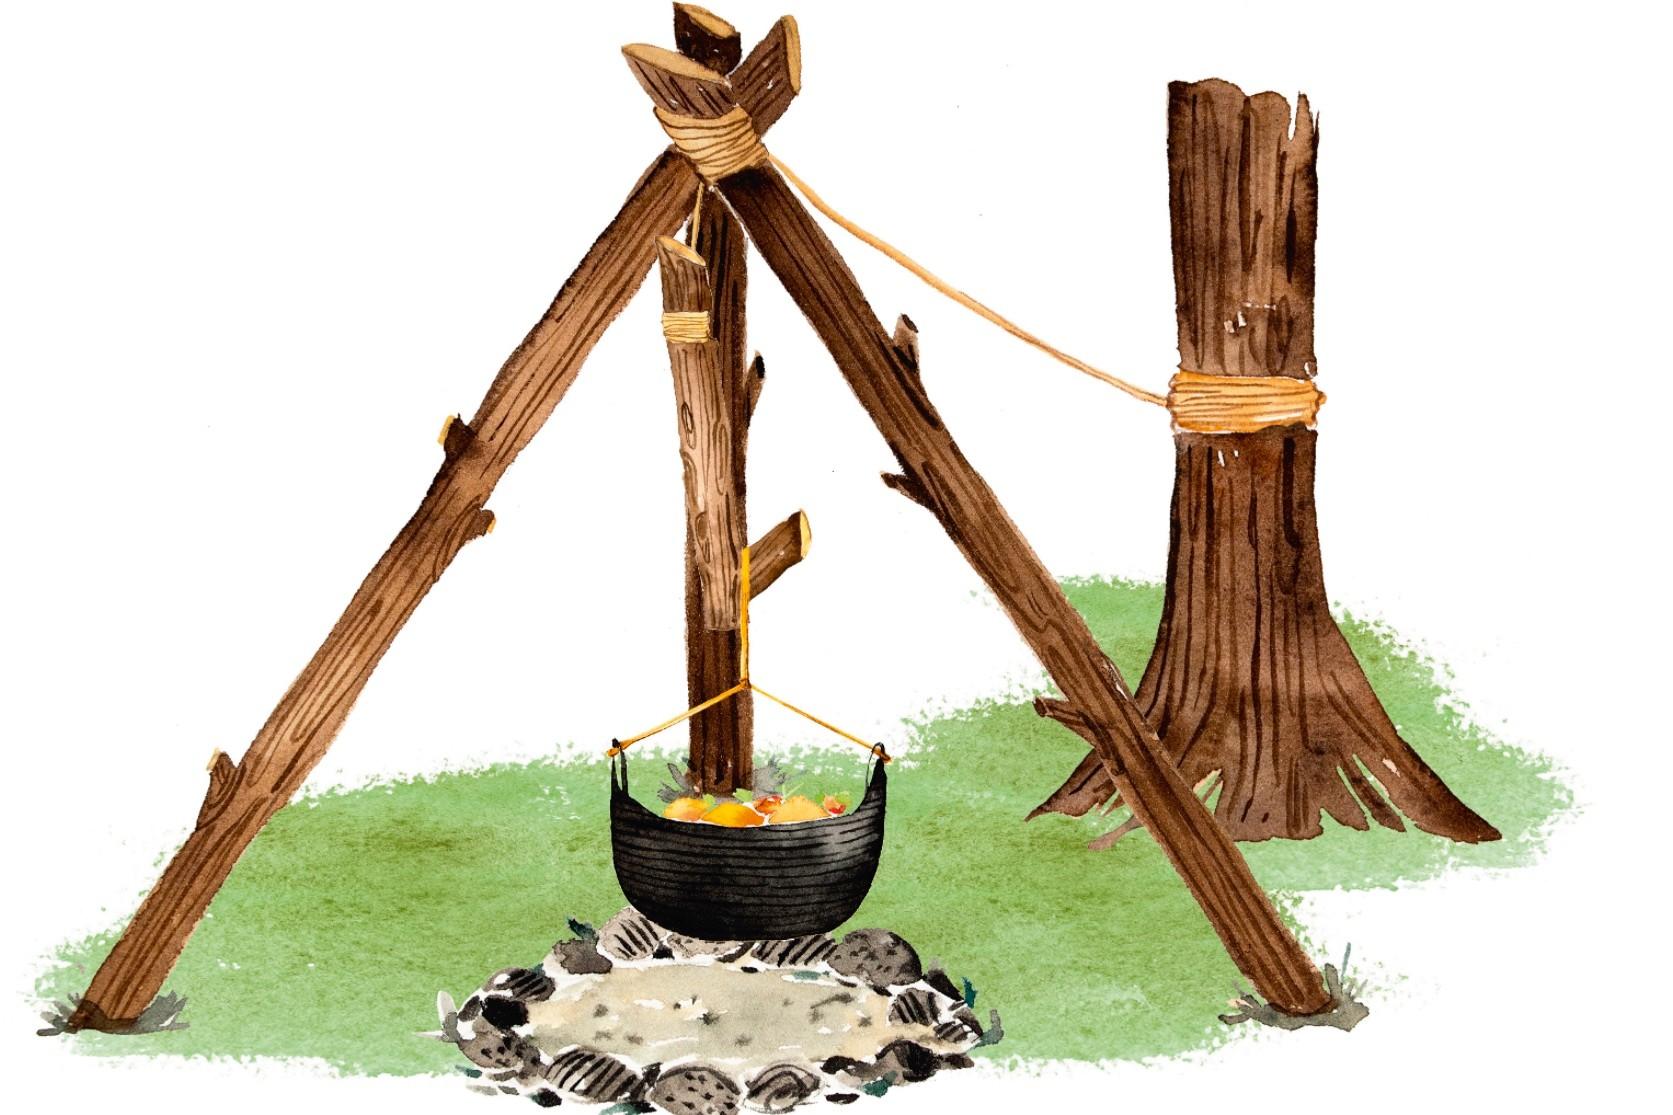 How to make a cooking campfire tripod ©Enya Todd